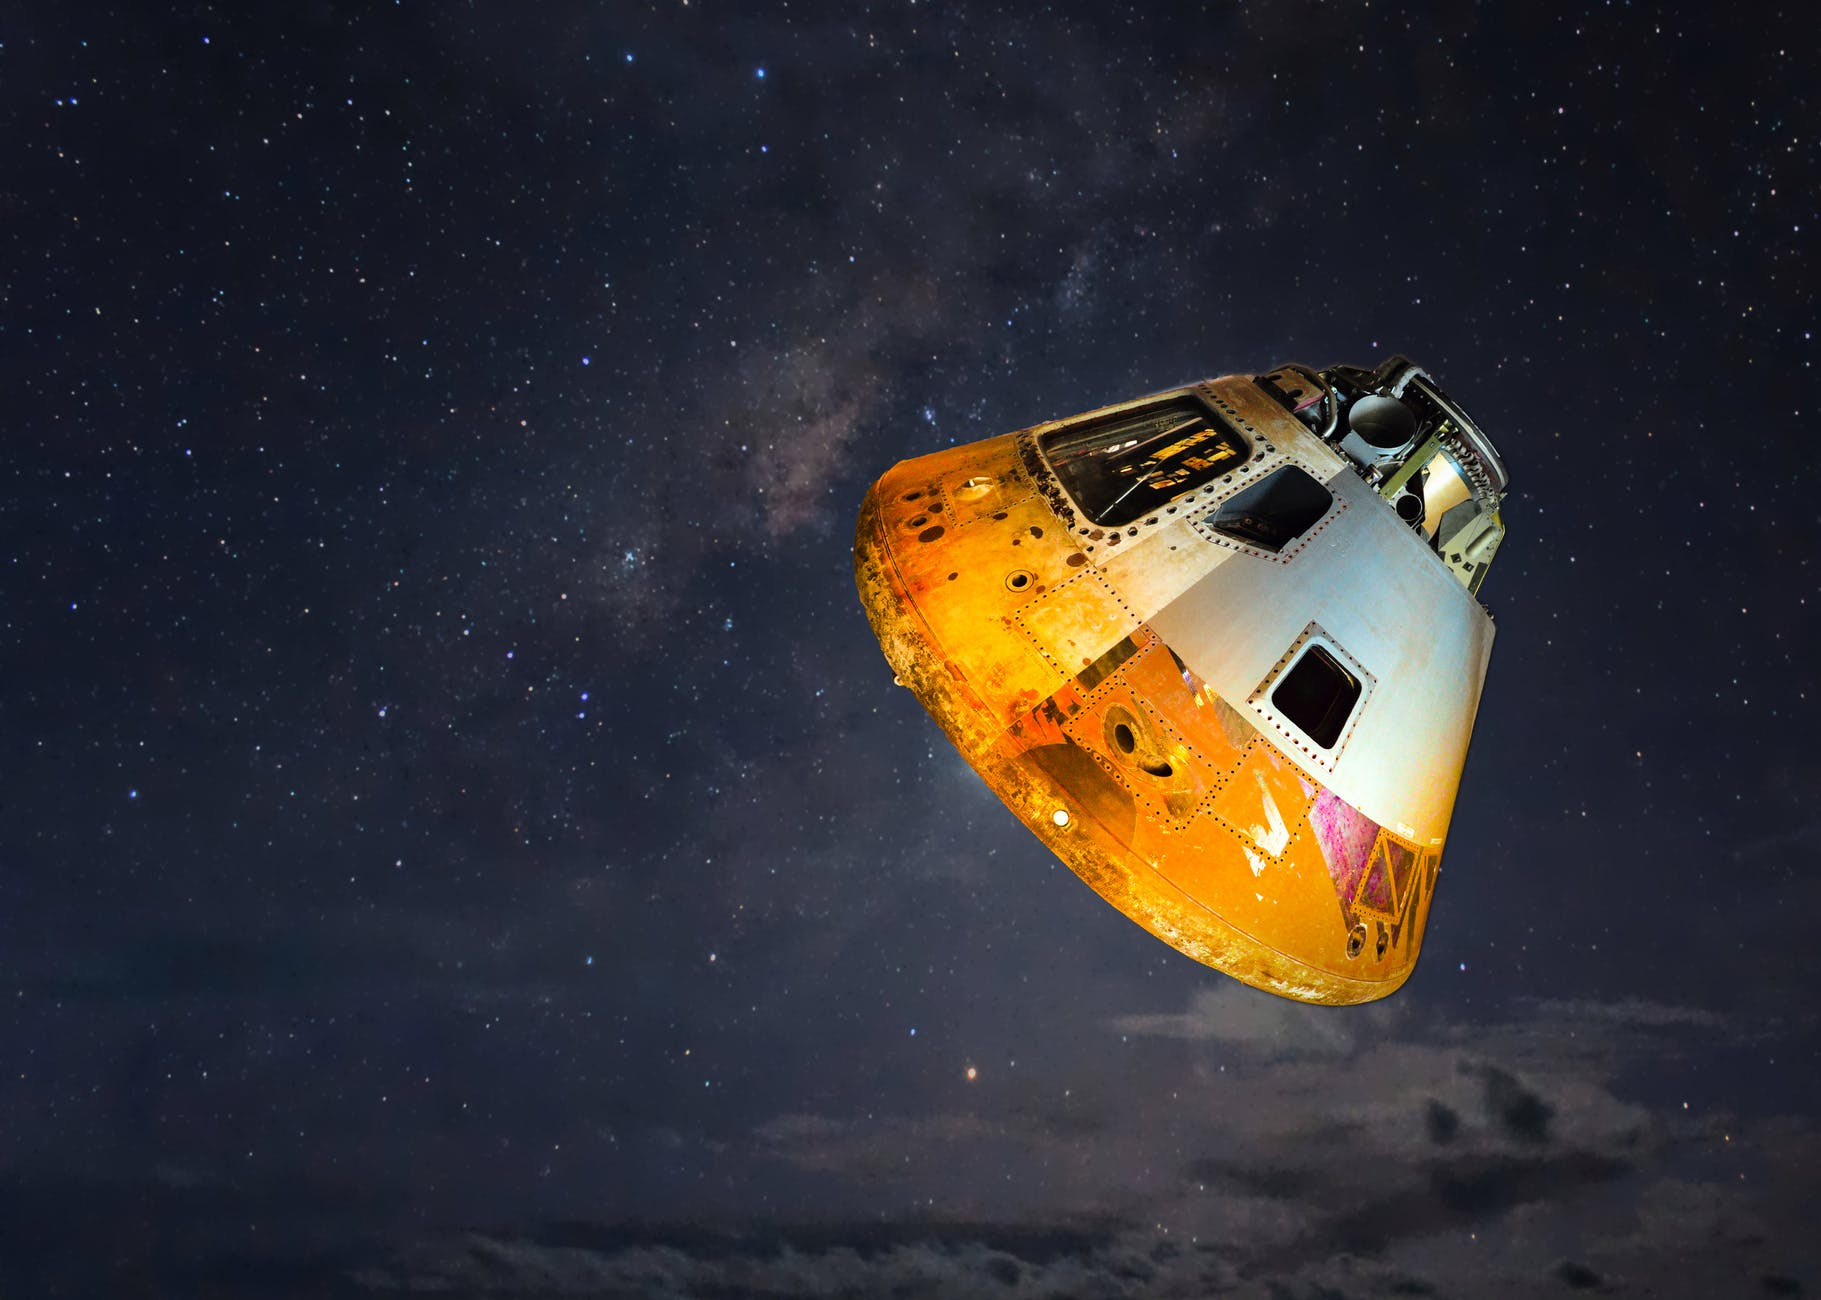 grey and orange spaceship